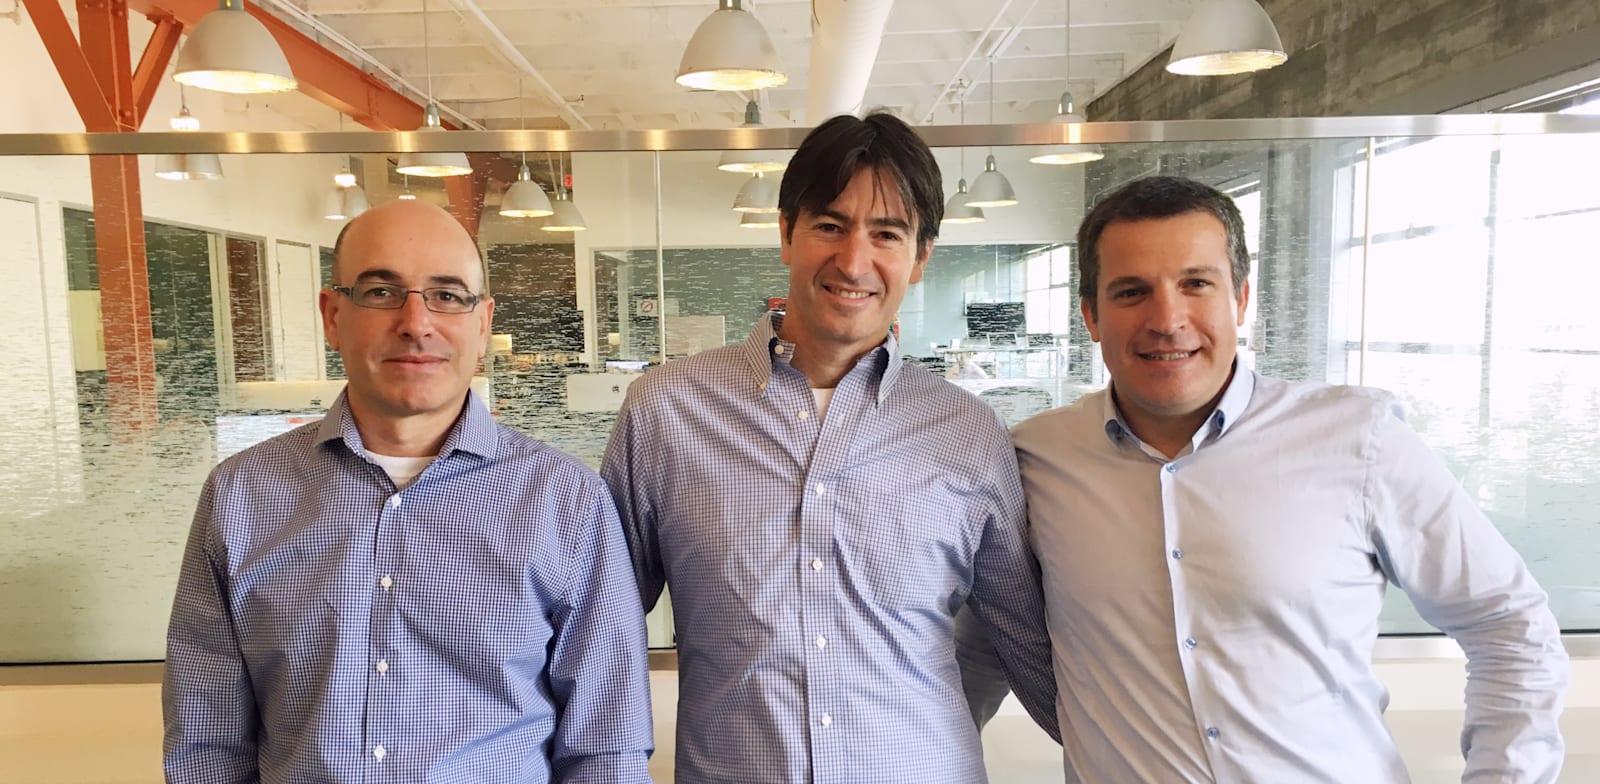 מייסדי Next Insurance, אלון חורי, גיא גולדשטיין ונסים טפירו / צילום: קרדיט: נקסט אינשורנס